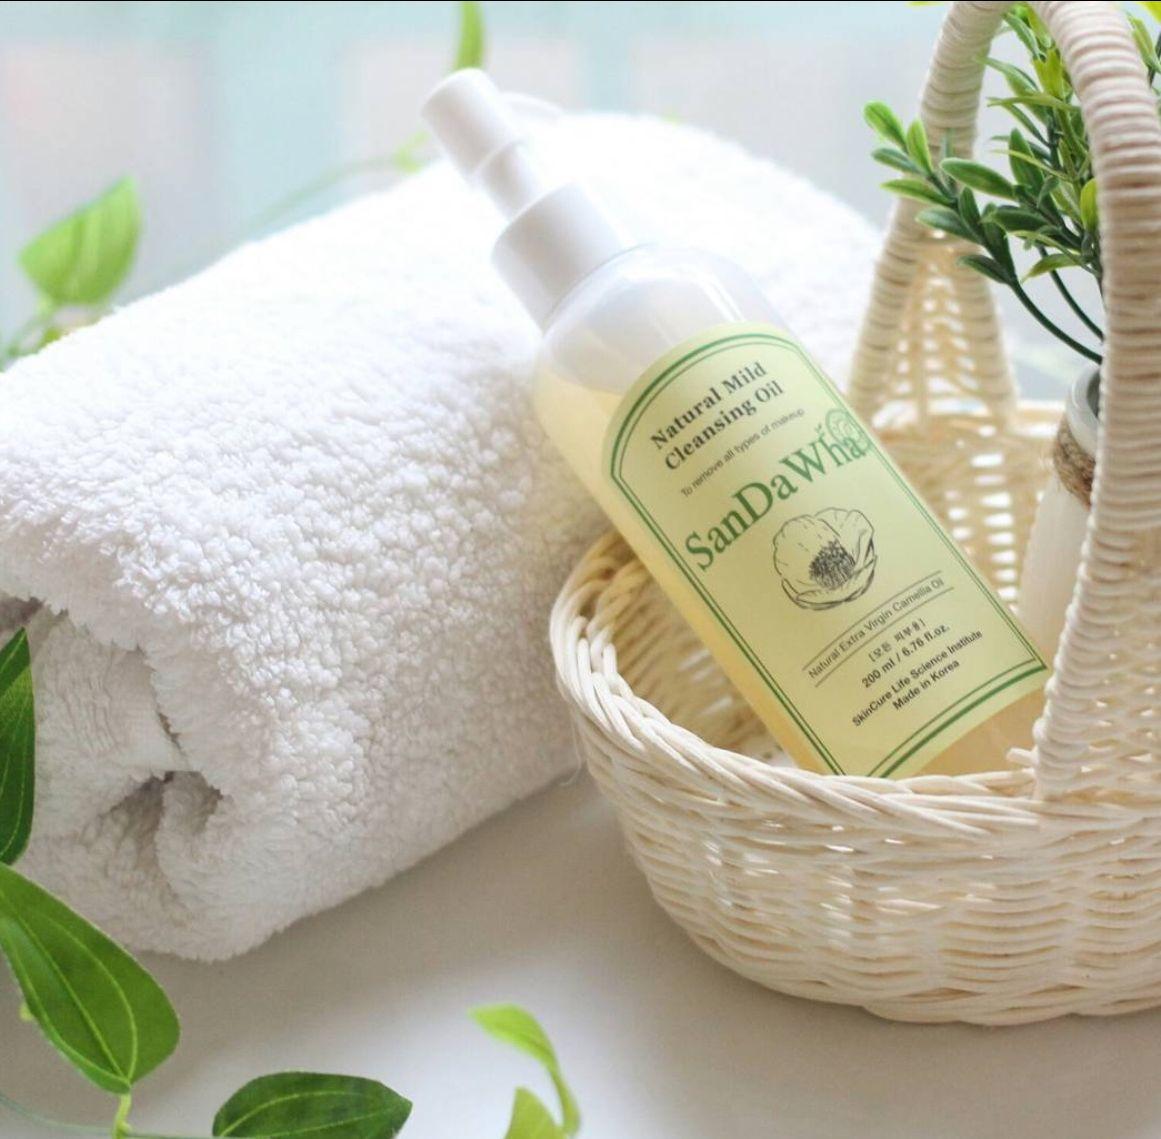 Korean Beauty Tips - SanDaWha Natural Mild Cleansing Oil